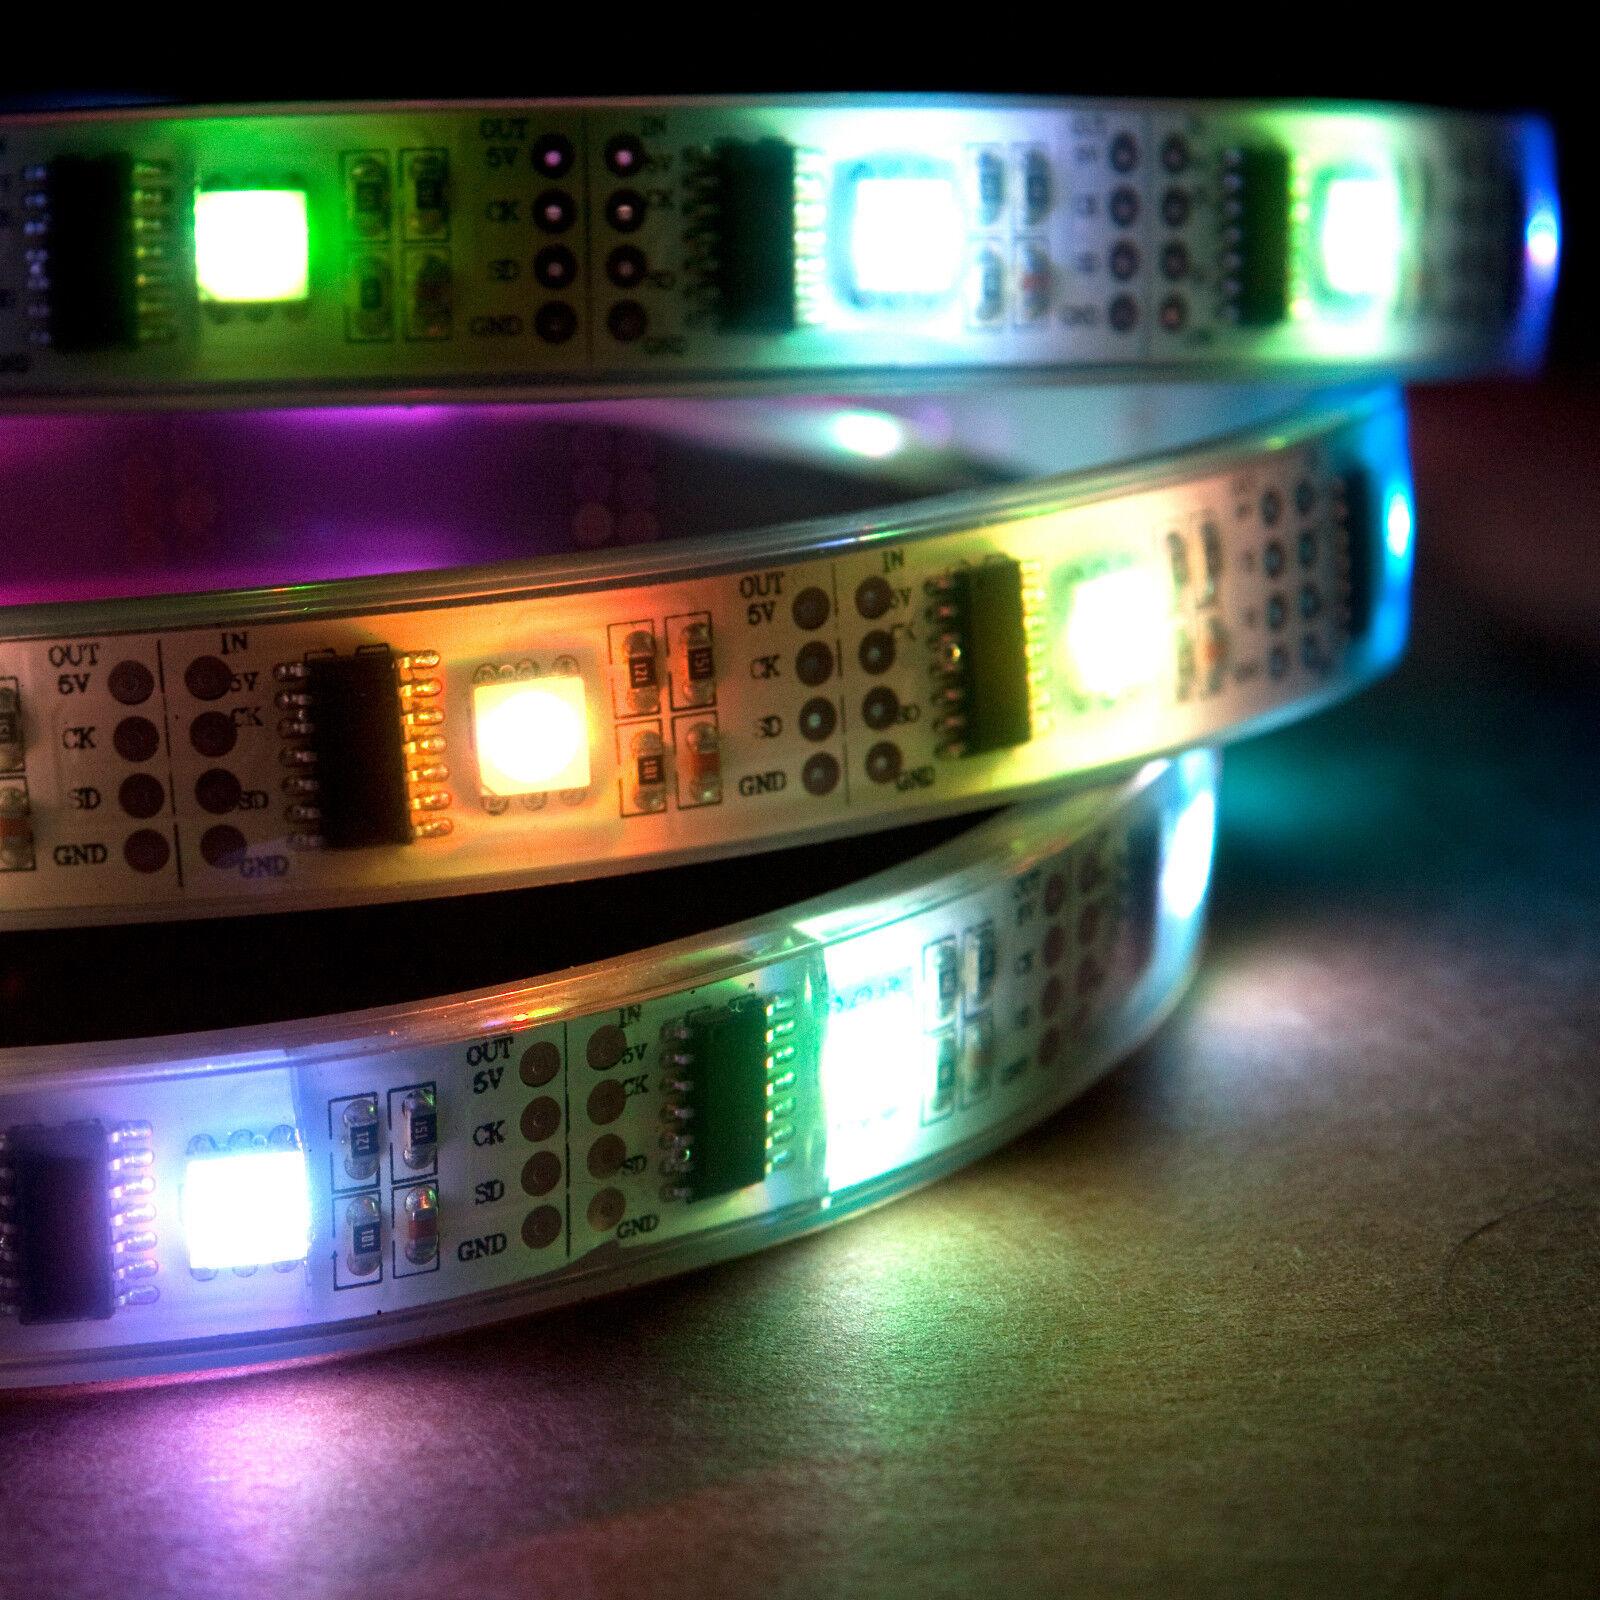 NooElec 5m Addressable RGB LED Strip 5v 32 Led m Waterproof Ws2801